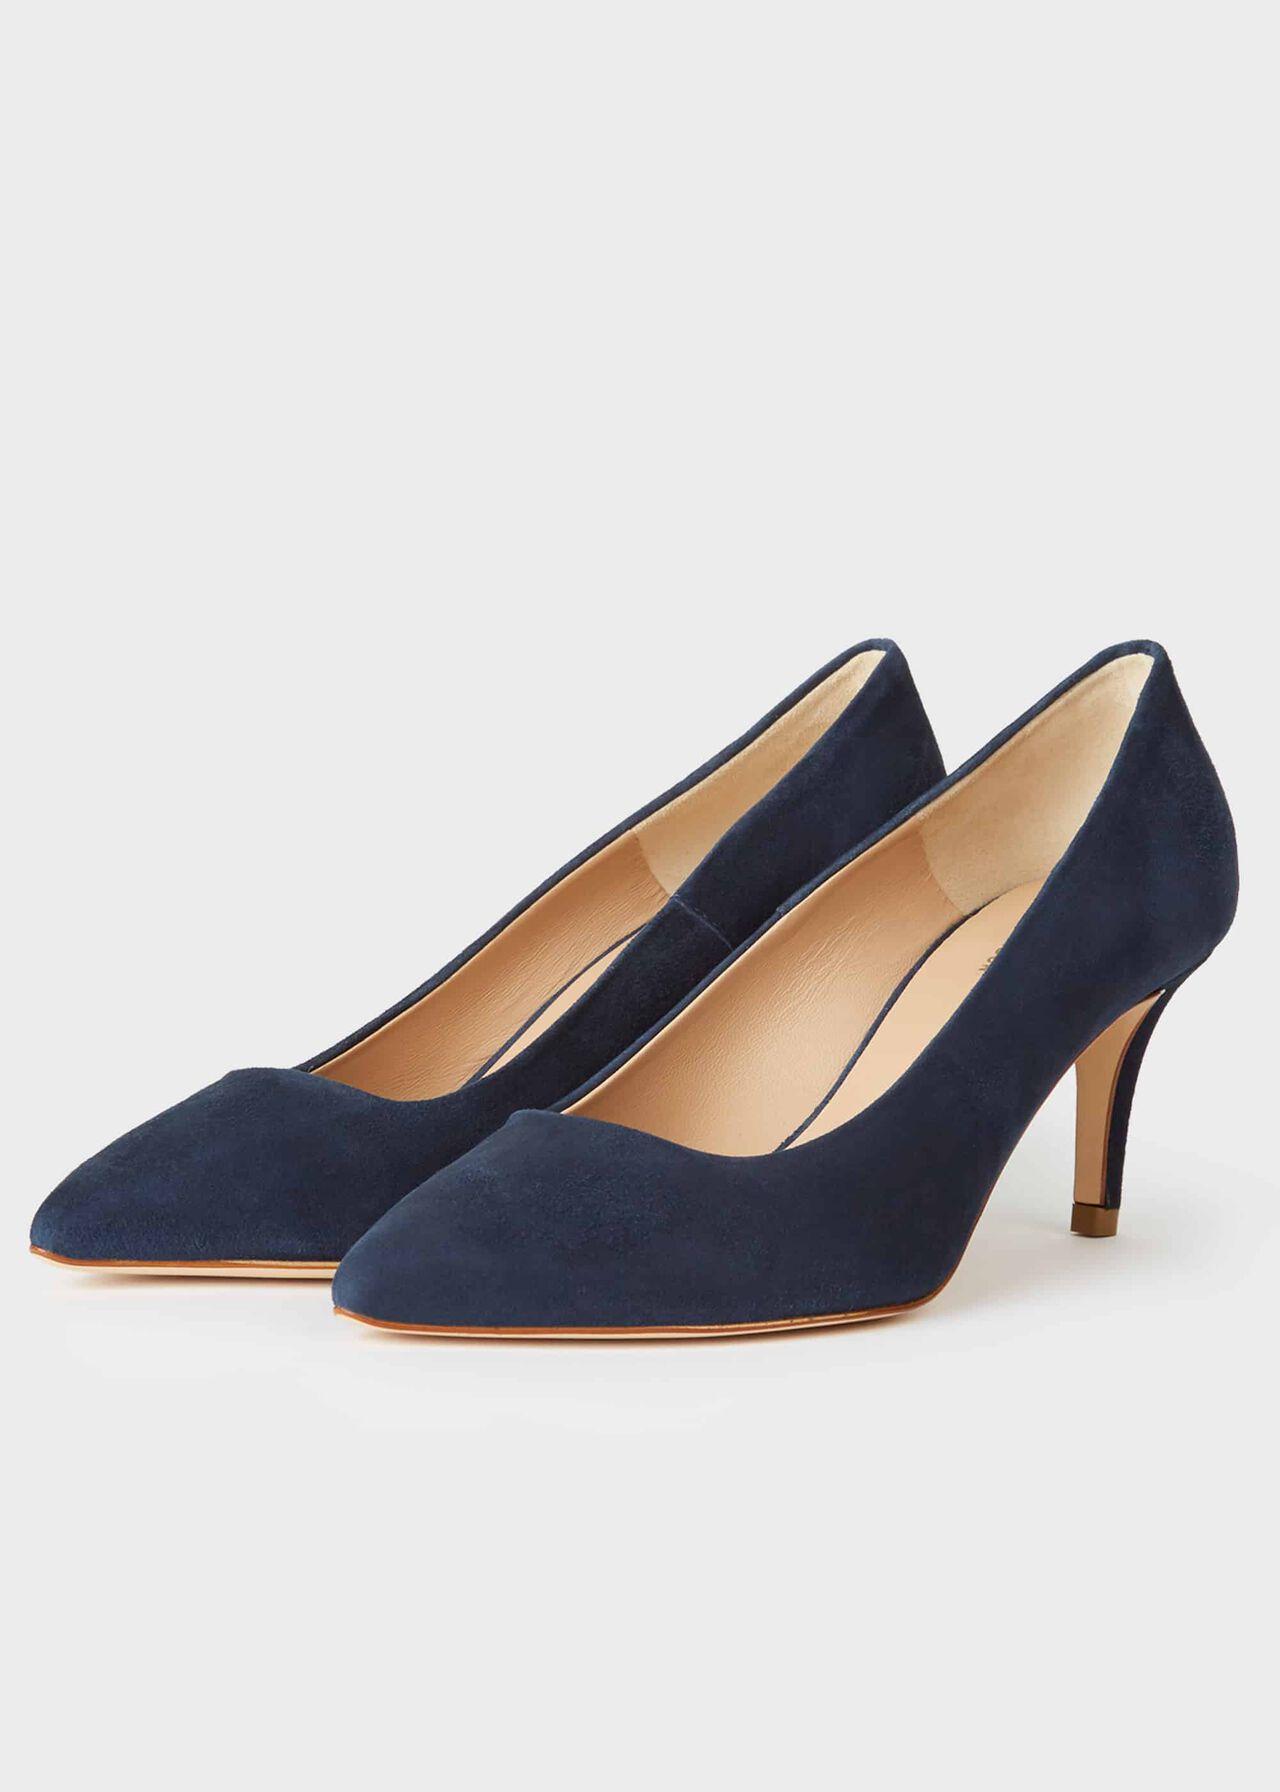 Elouise Suede Stiletto Court Shoes Midnight